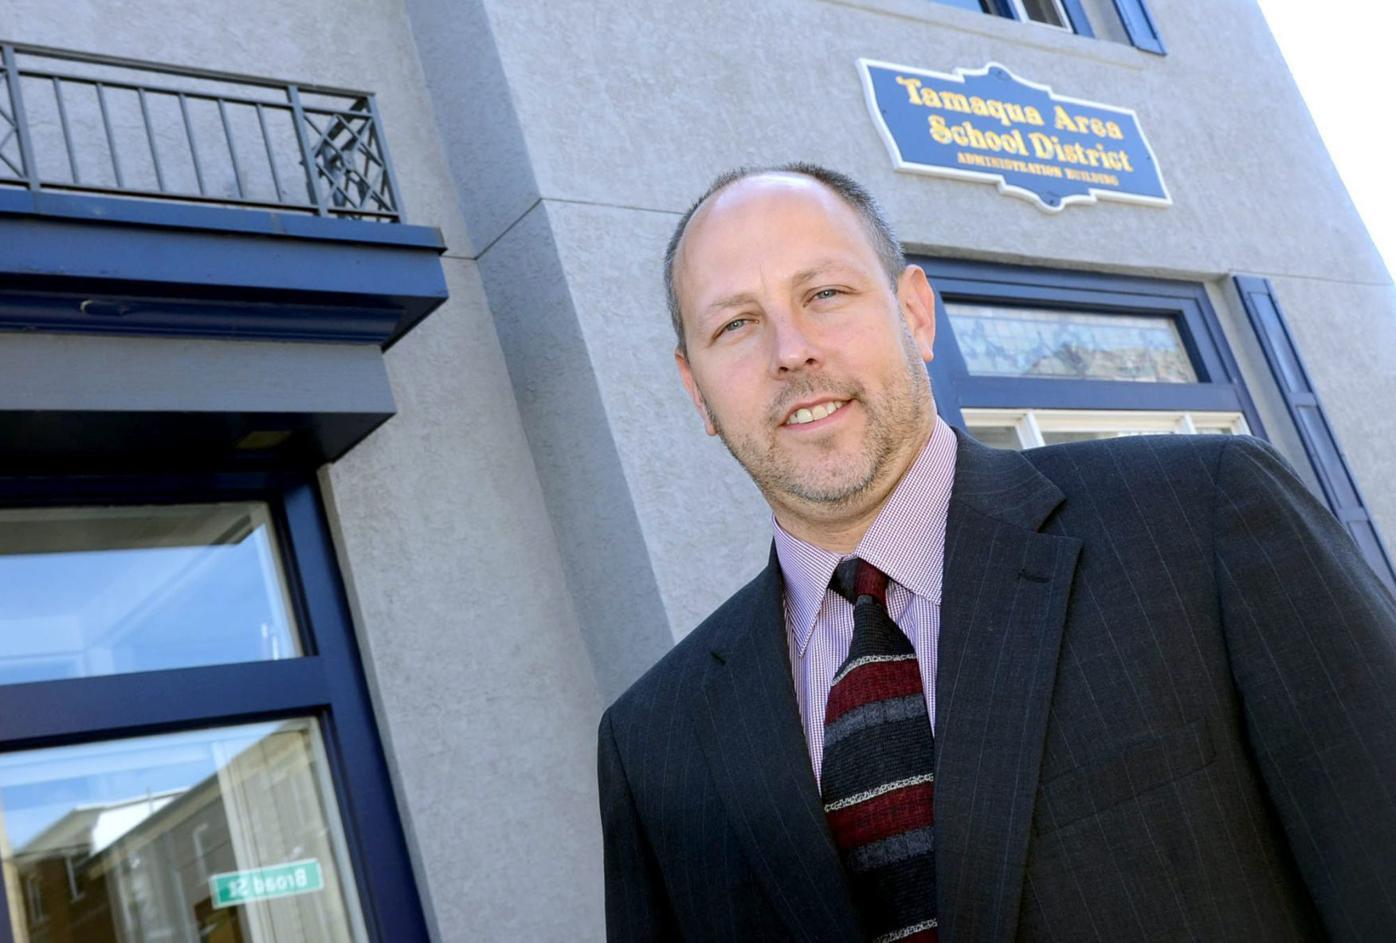 TASD superintendent Ray Kinder